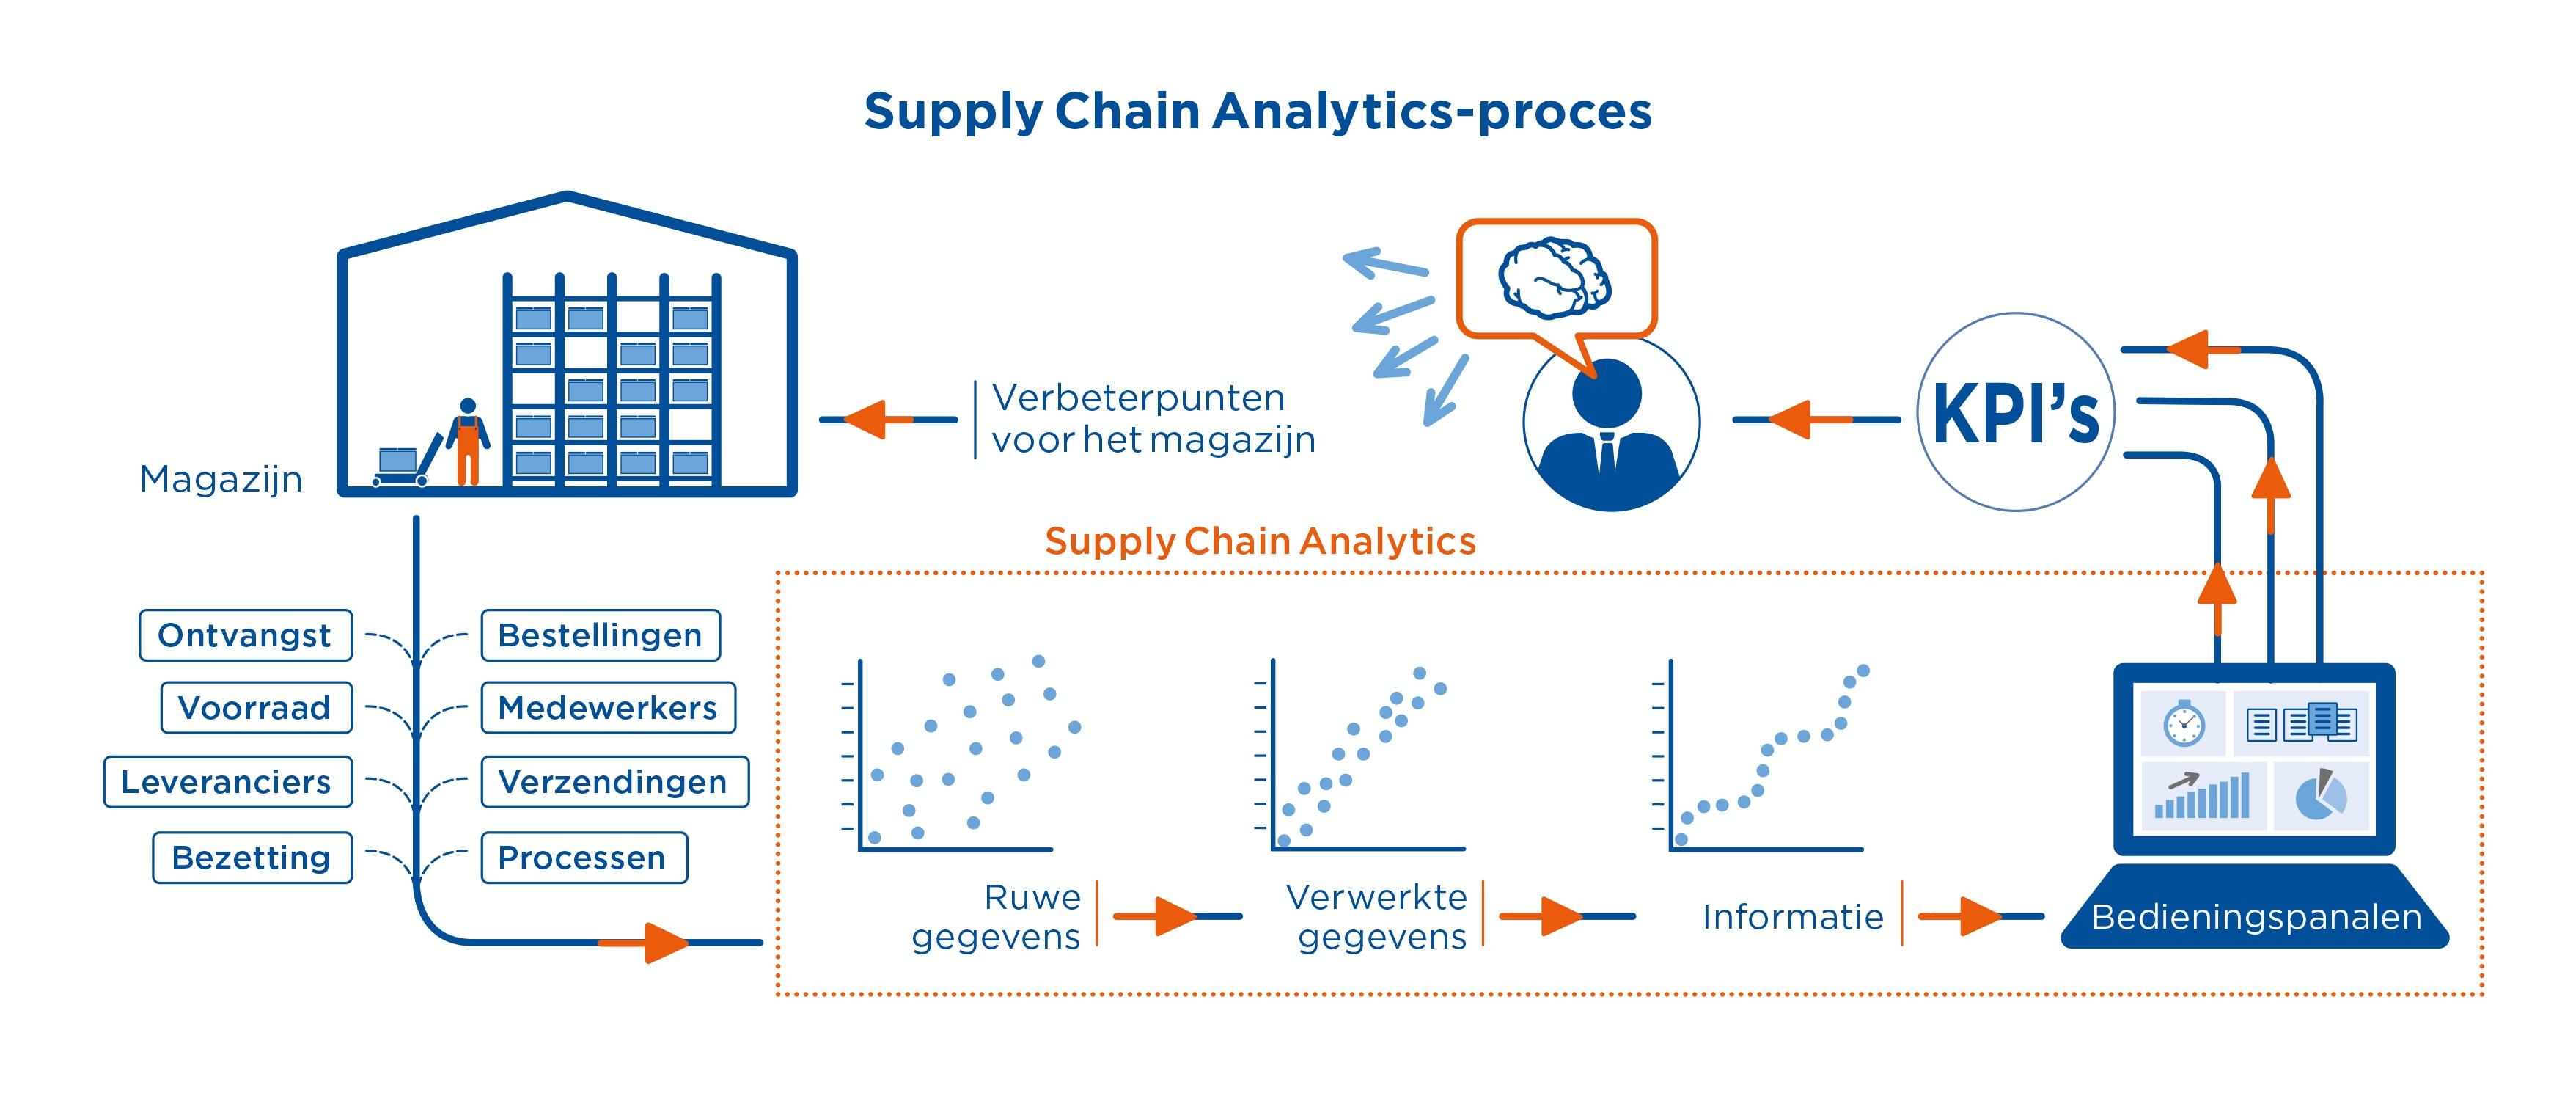 Supply Chain Analytics-proces